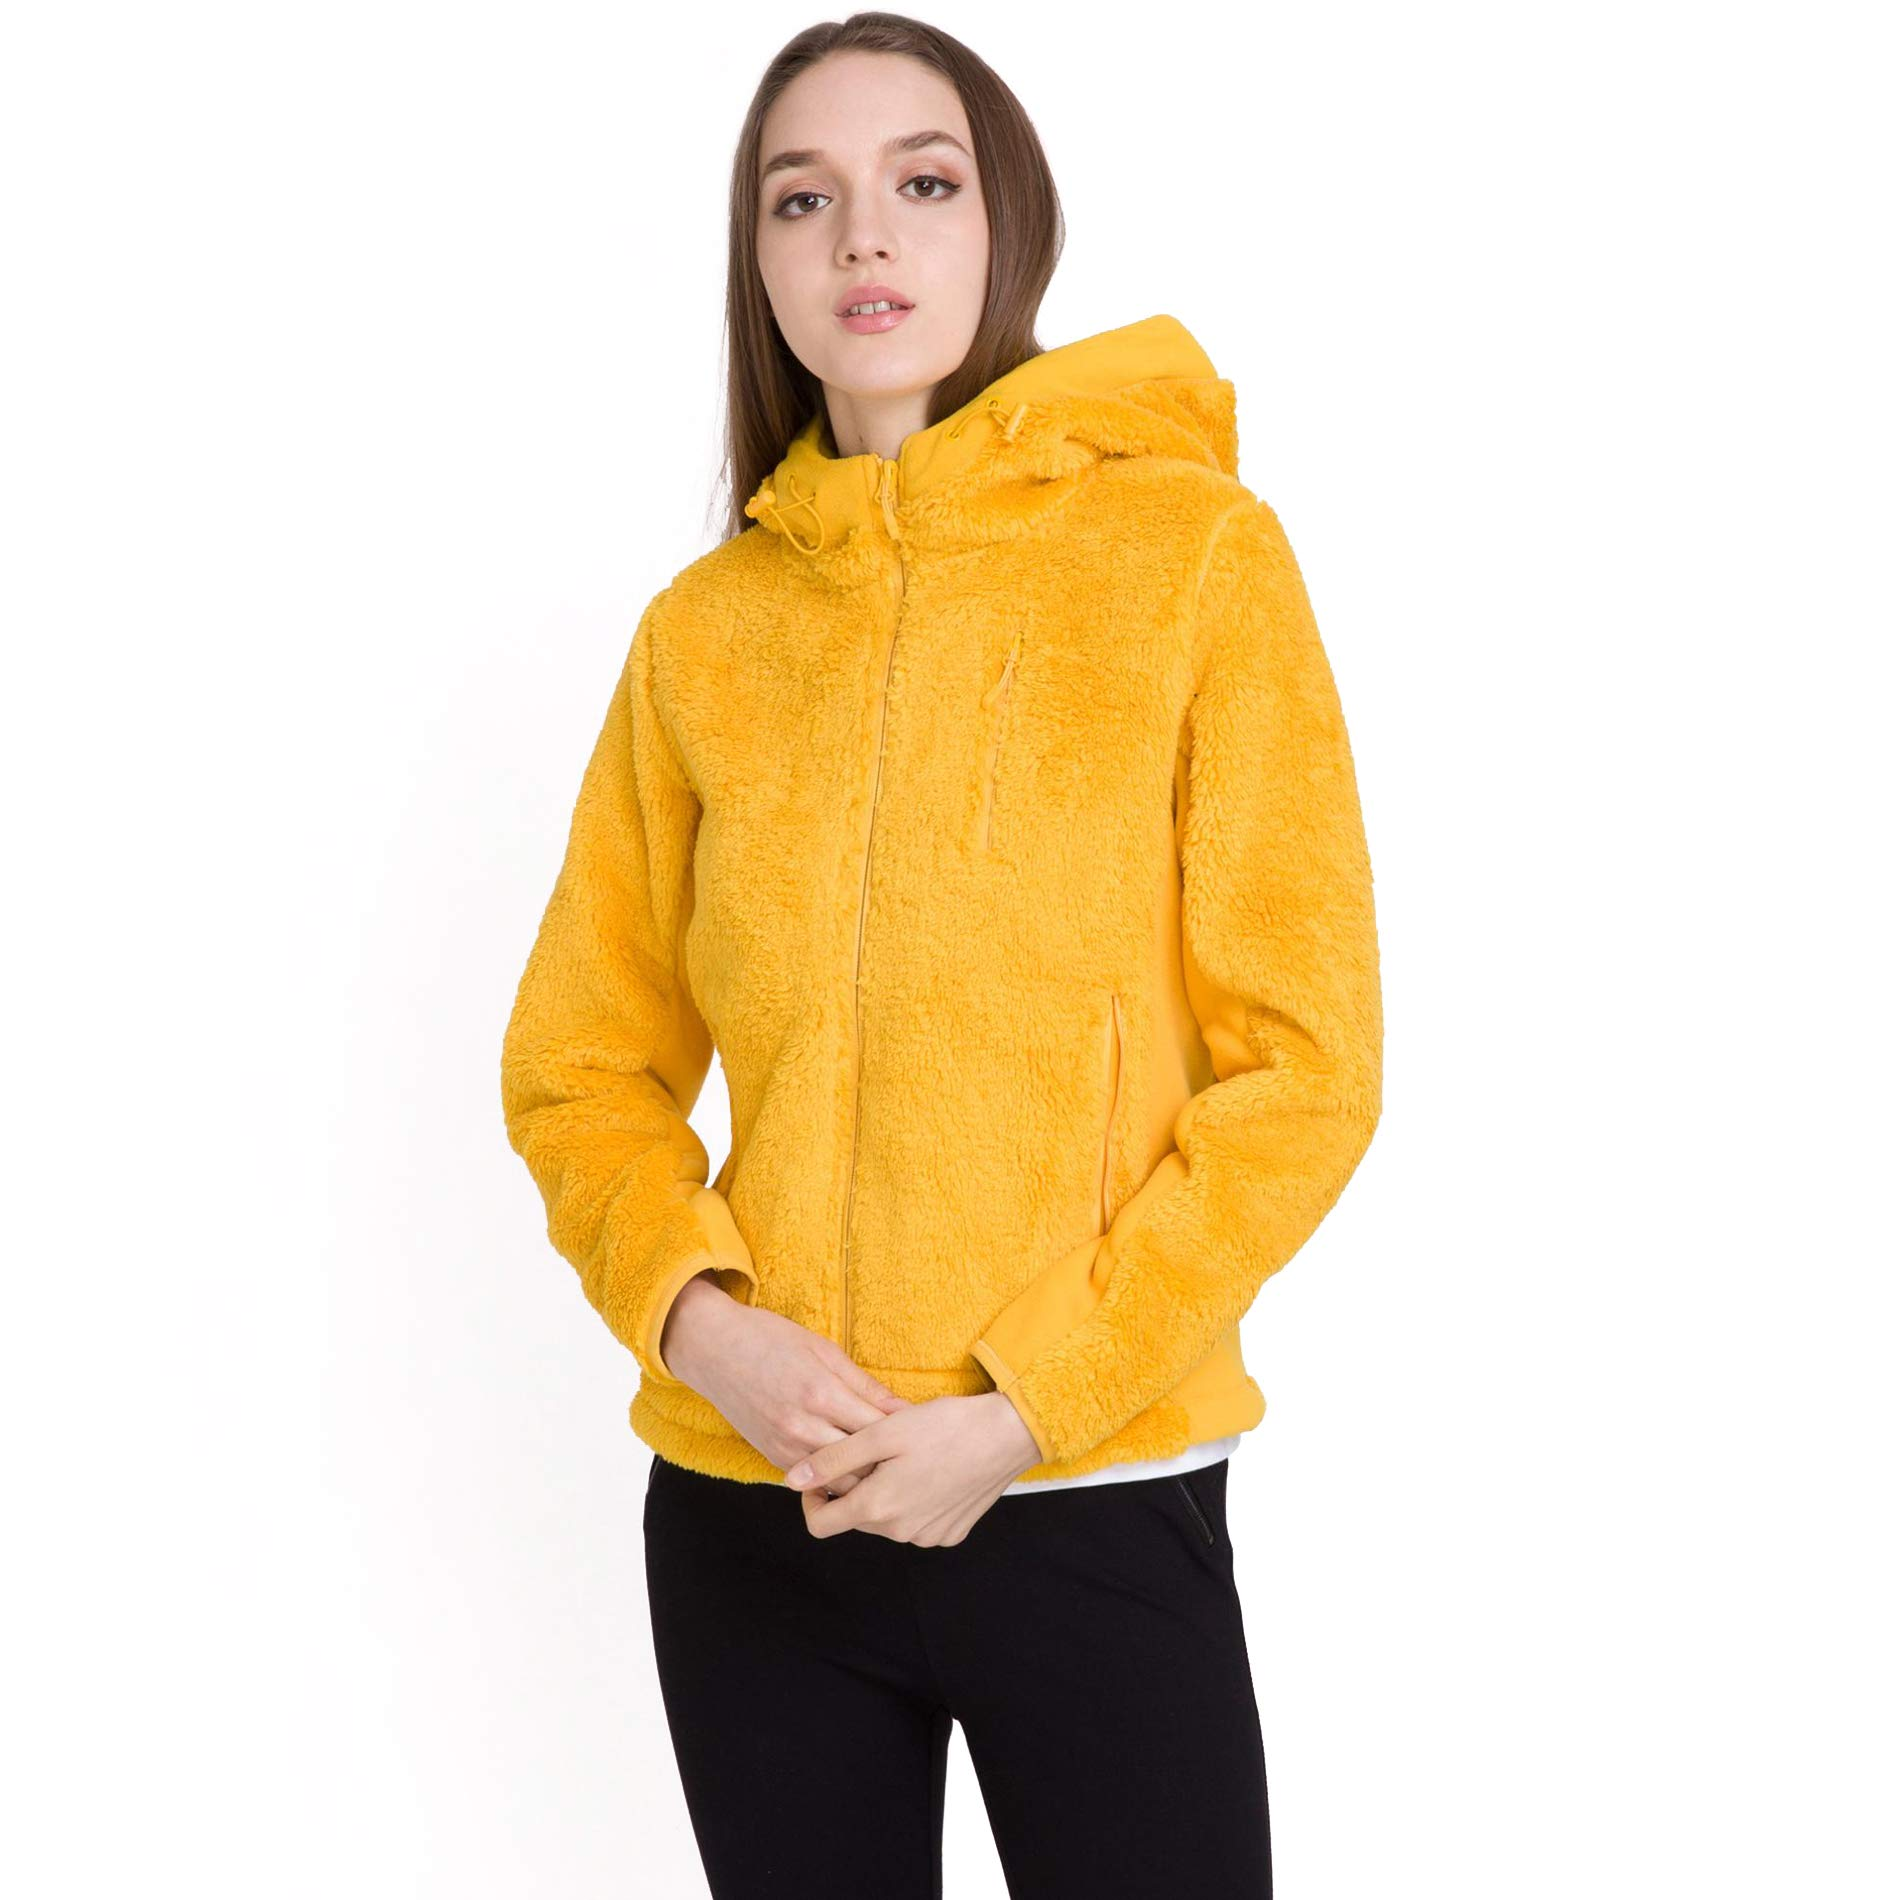 bossini Womens Jacket Multi-Purpose Windbreaker Multi-Functional Jacket Hoodie Jacket